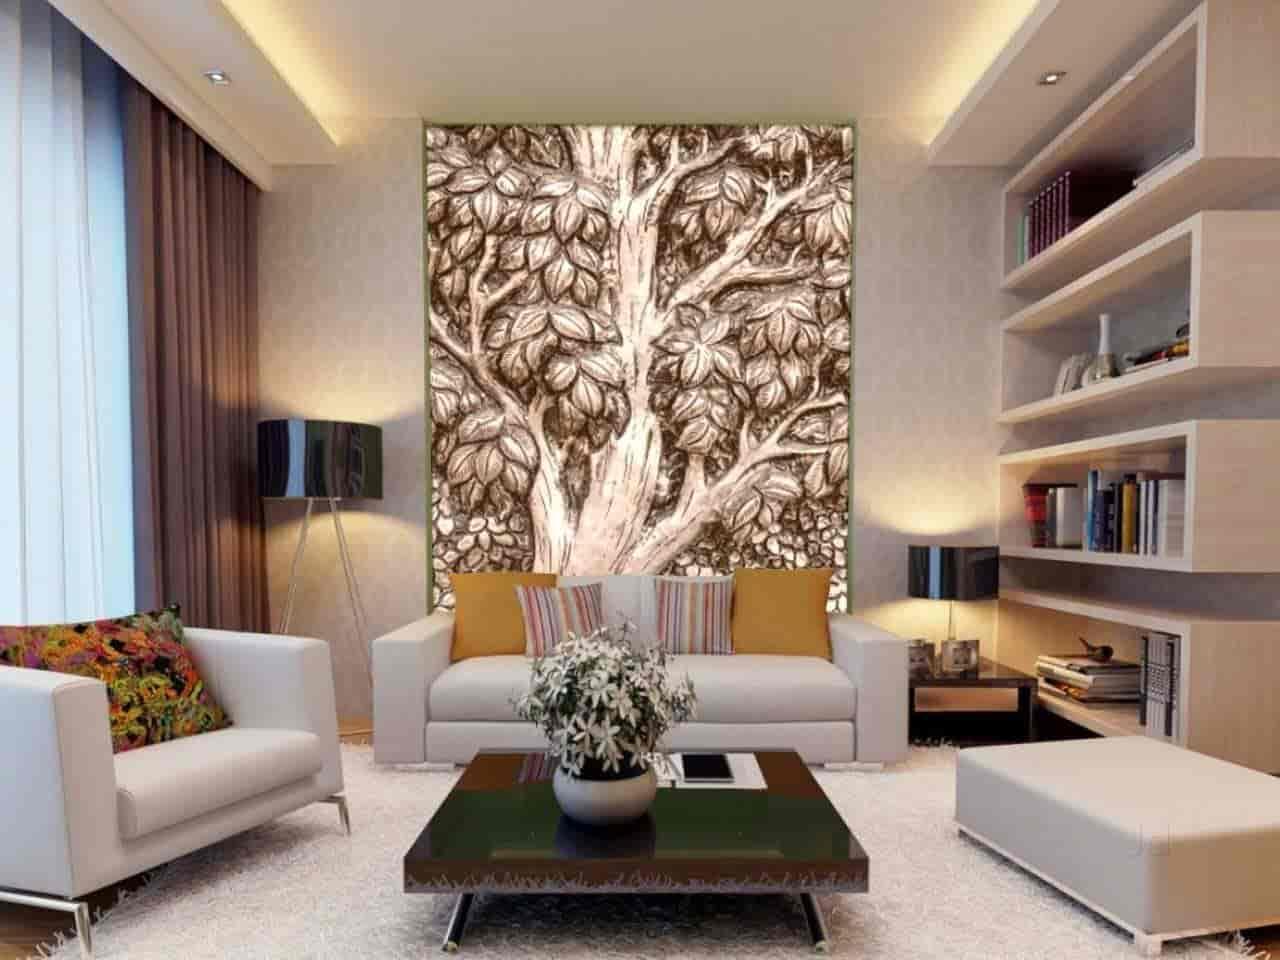 Exceptional ... Interior Decoration   Casa Magic   The Home Decor Store Photos, Vashi,  ...